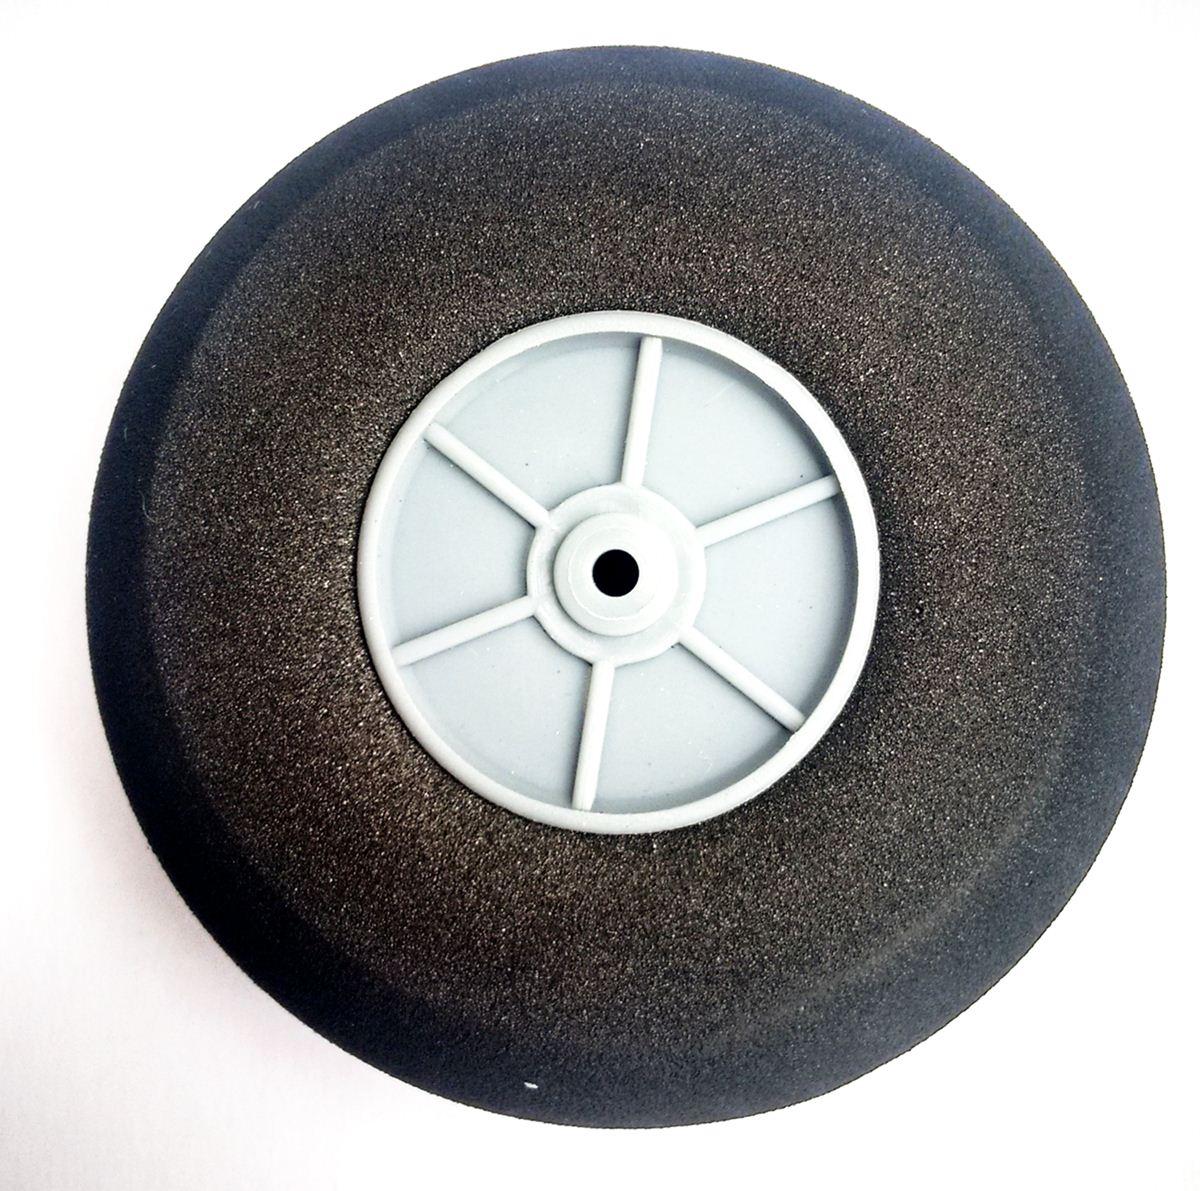 5621 - Roda Light Foam (Diâmetro: 75mm, Largura: 20mm)